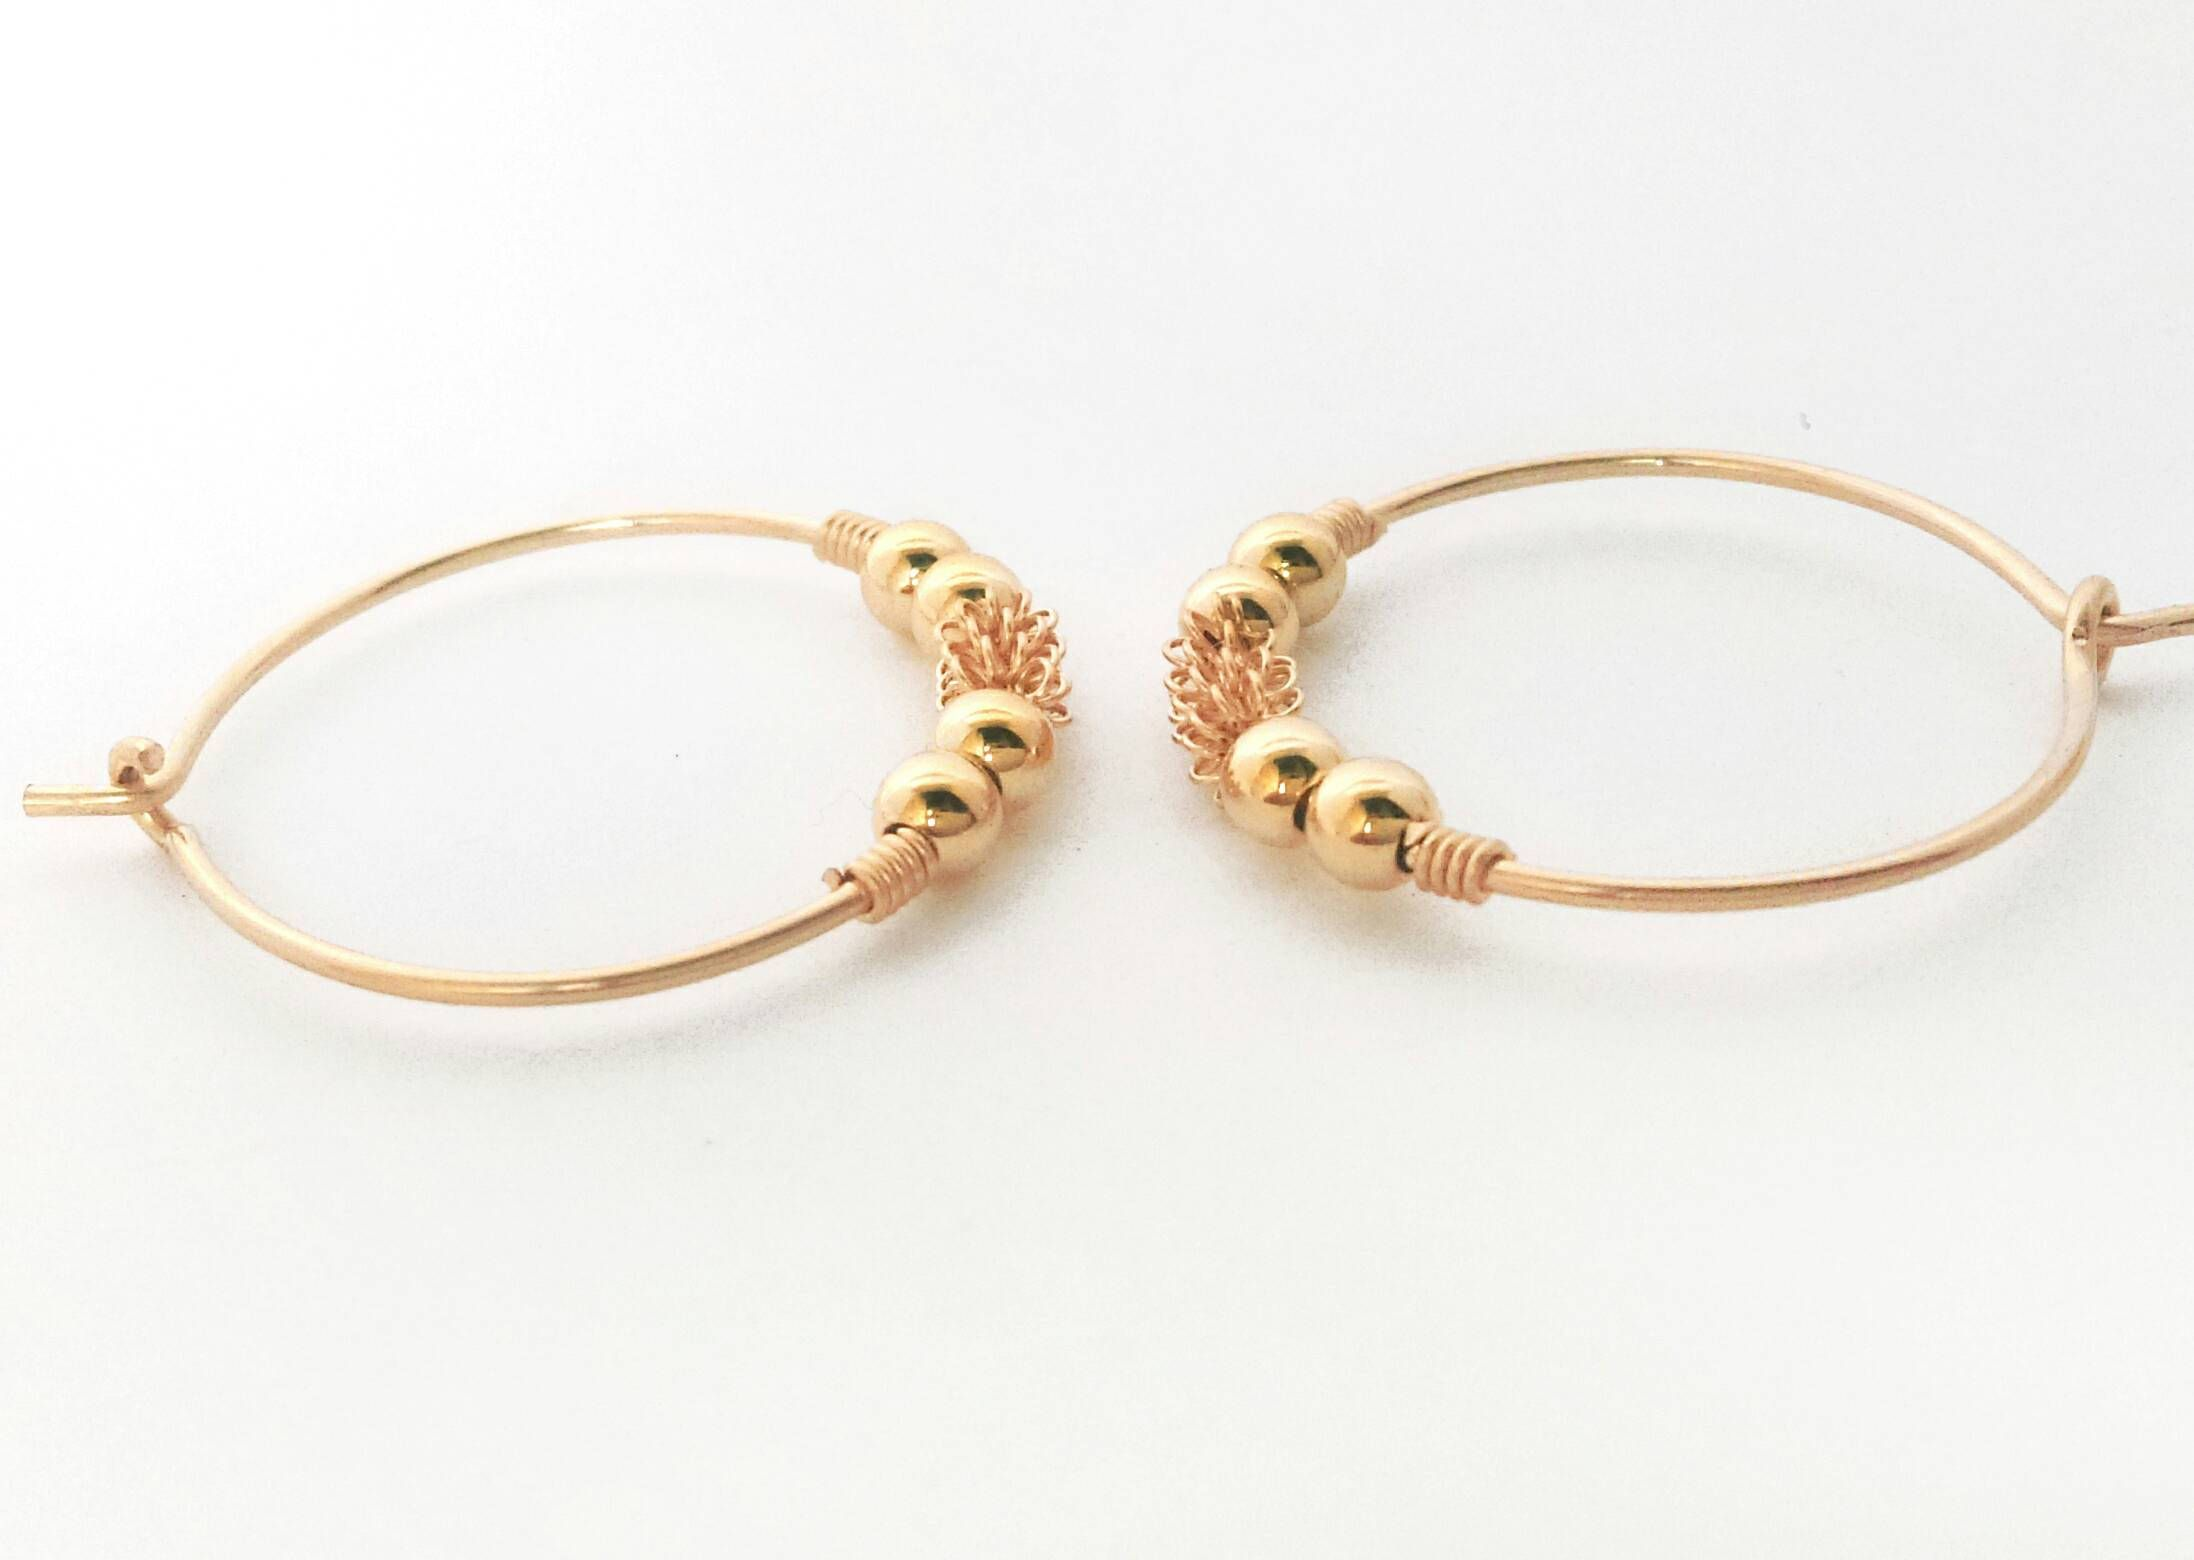 14k Yellow Gold Hoop Earrings For Women S Thin Filled